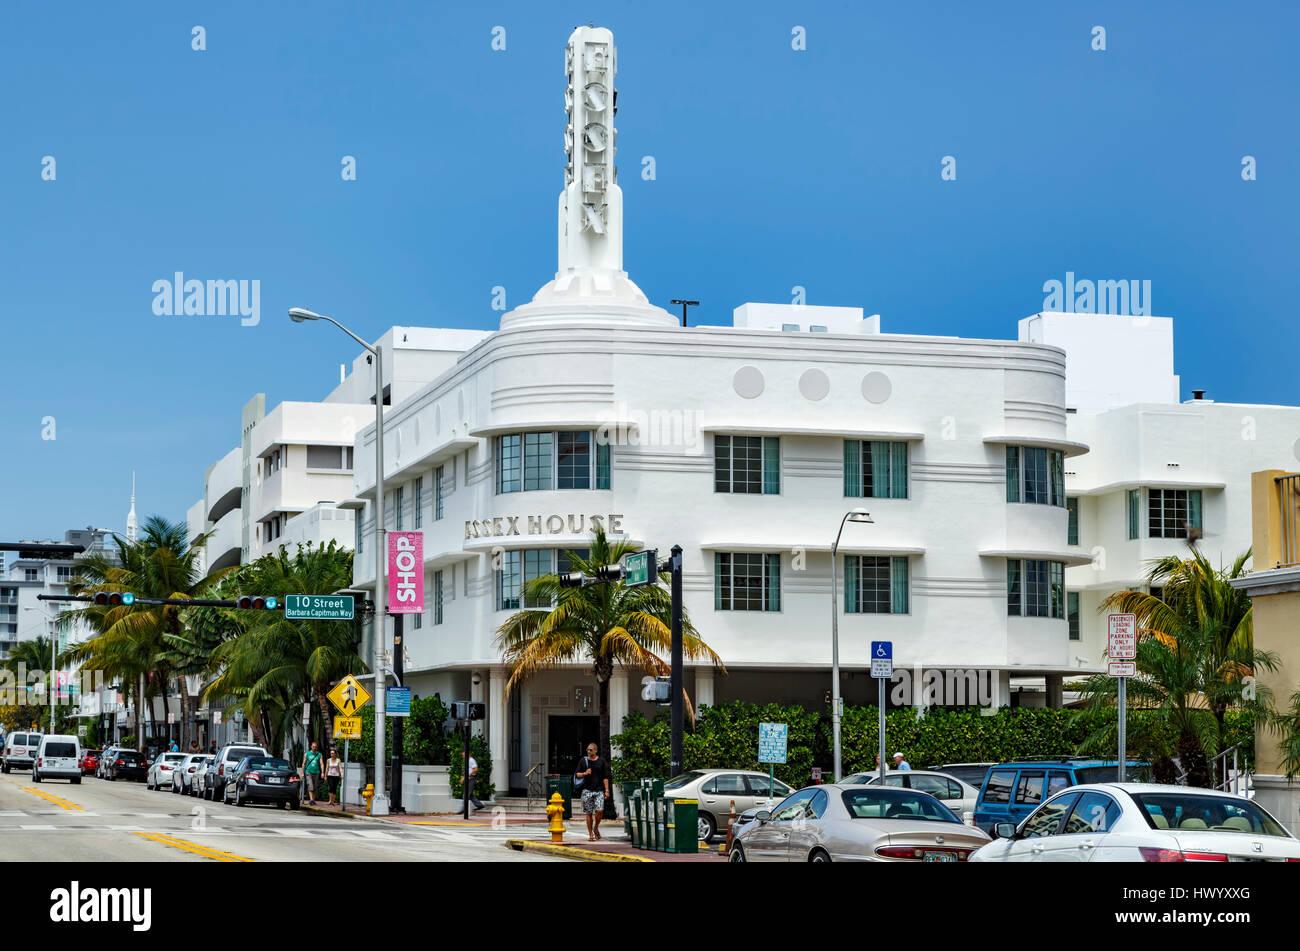 Essex house hotel miami beach fl pic 30